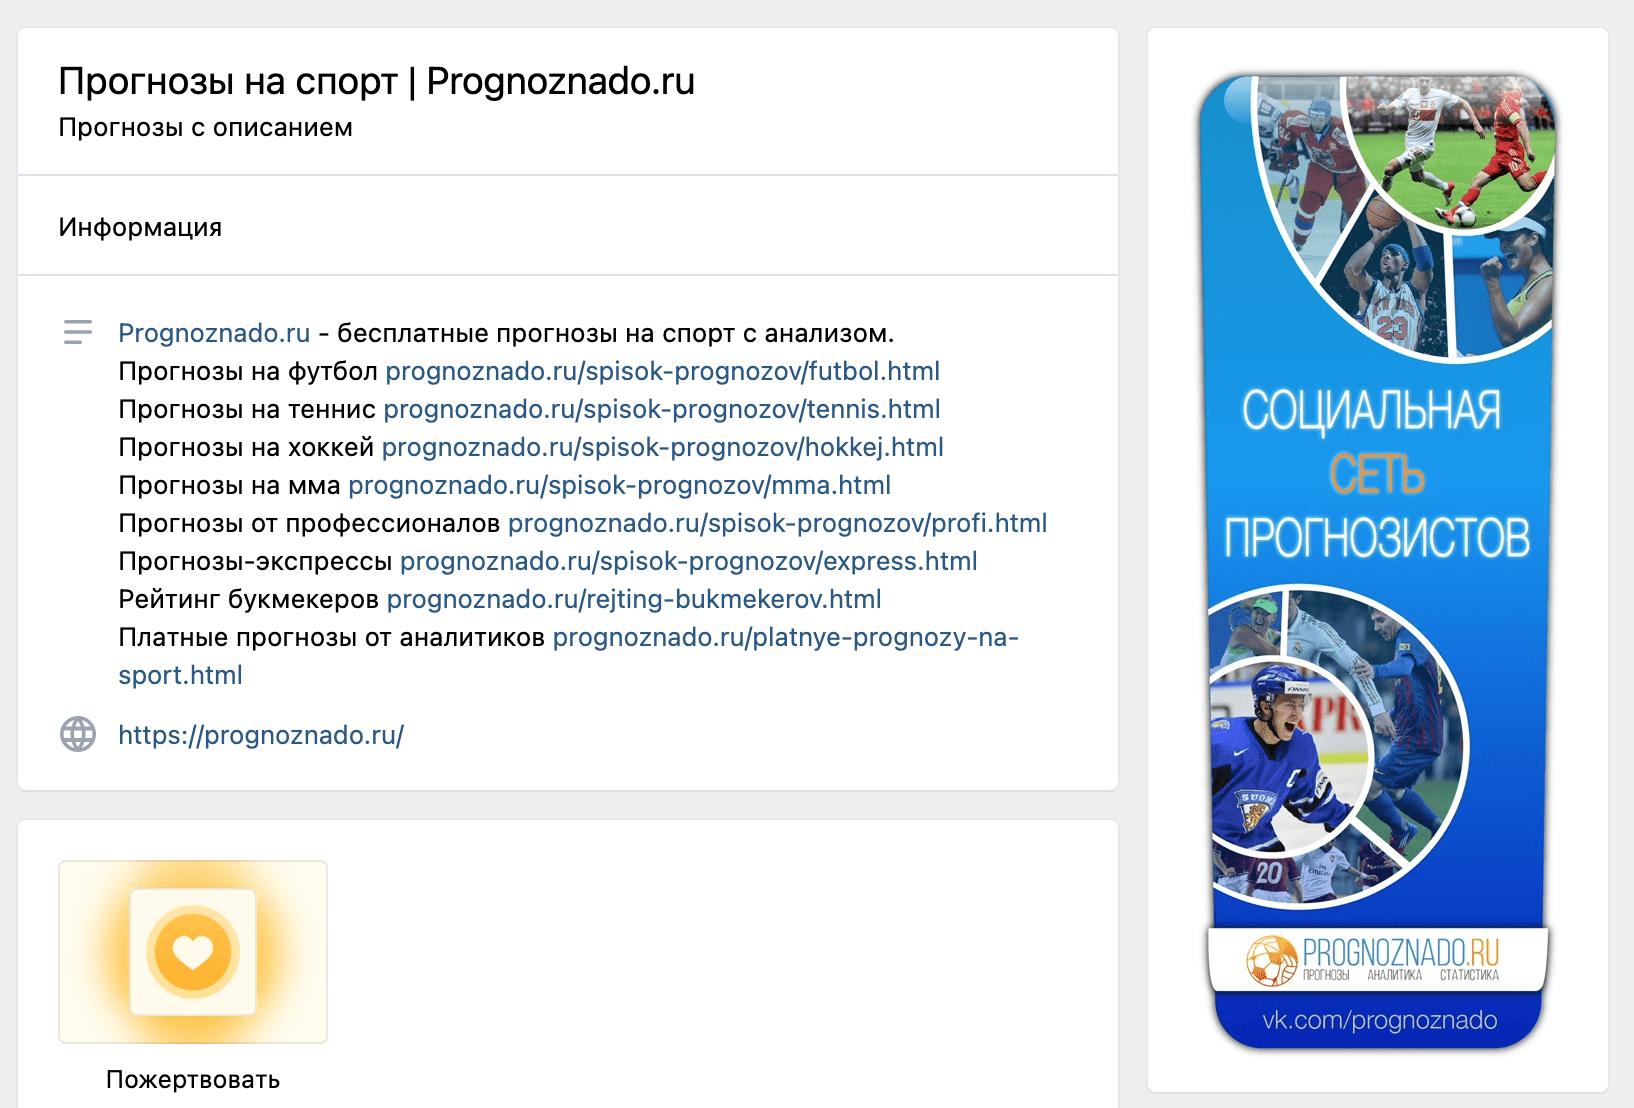 Группа ВК Prognoznado ru (ПрогнозНадо ру)